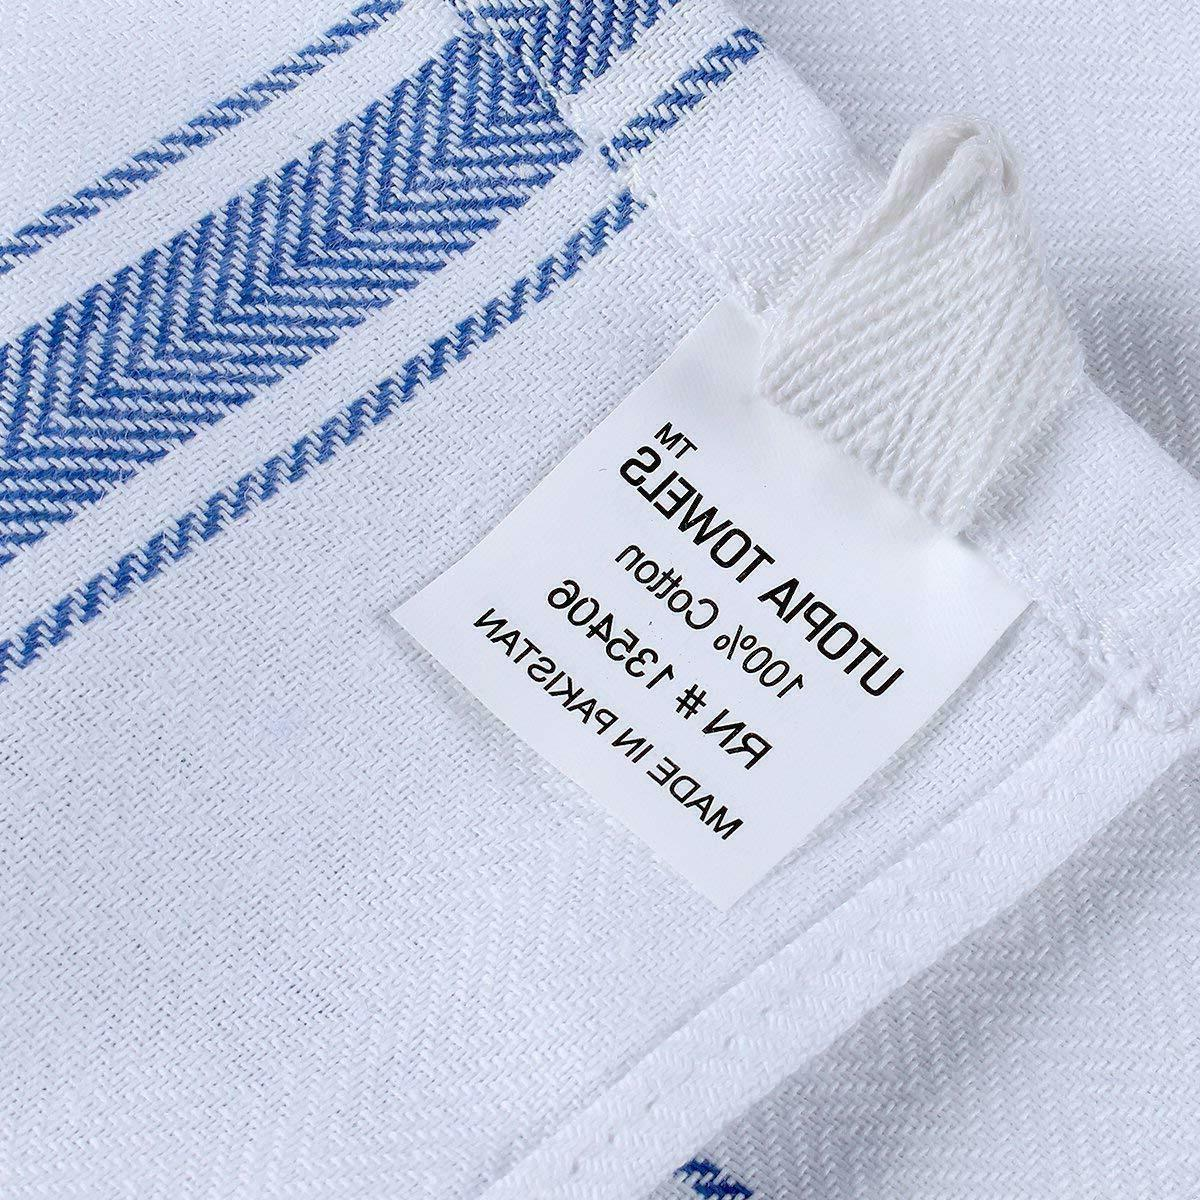 Dish 12 White 25 Kitchen Towels Lot Utopia Towels